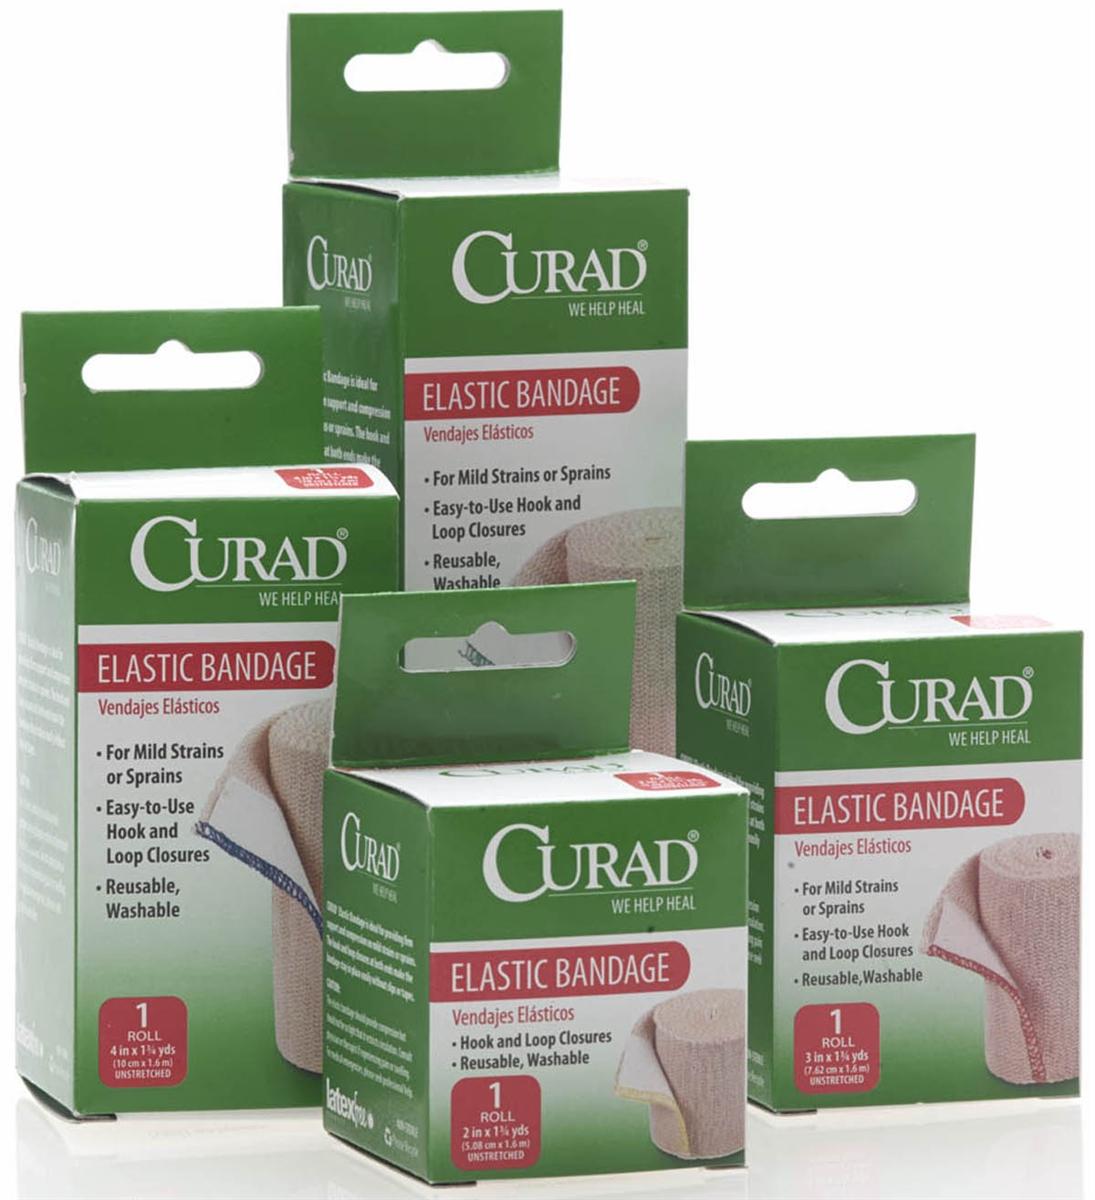 Medline Cur4902 Curad Velcro Elastic Bandage Wraps 24 Box